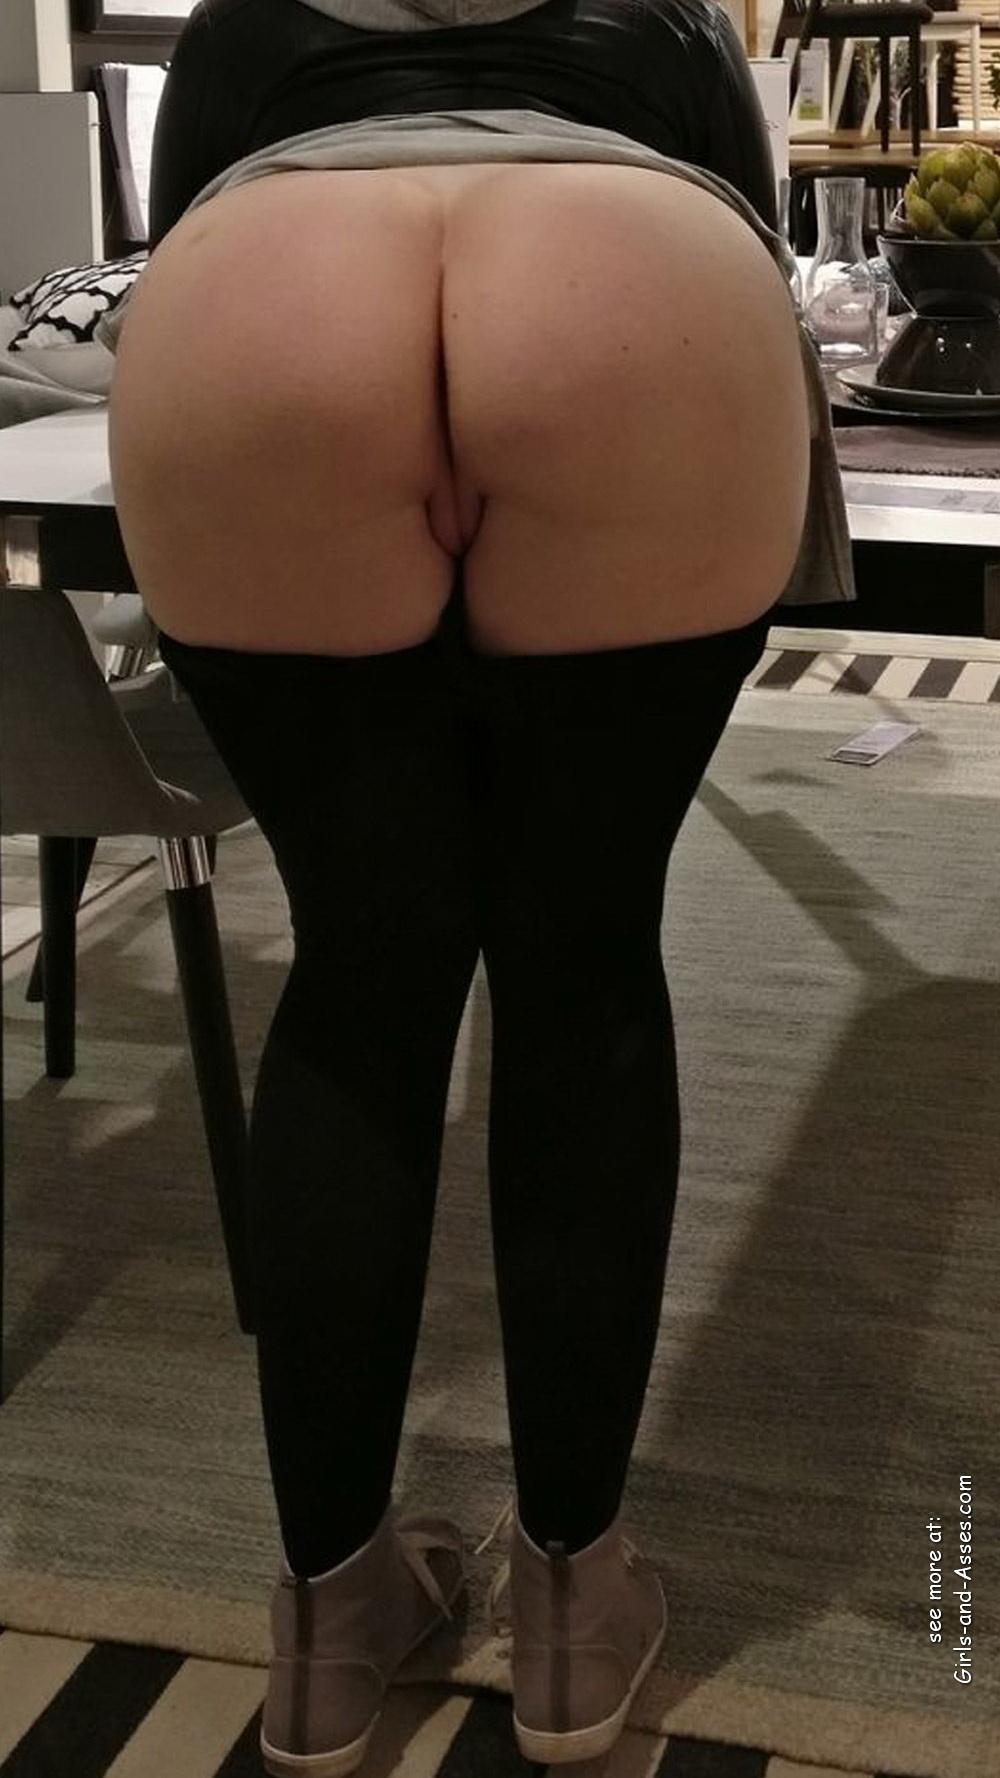 nude female backside in public photo 00929